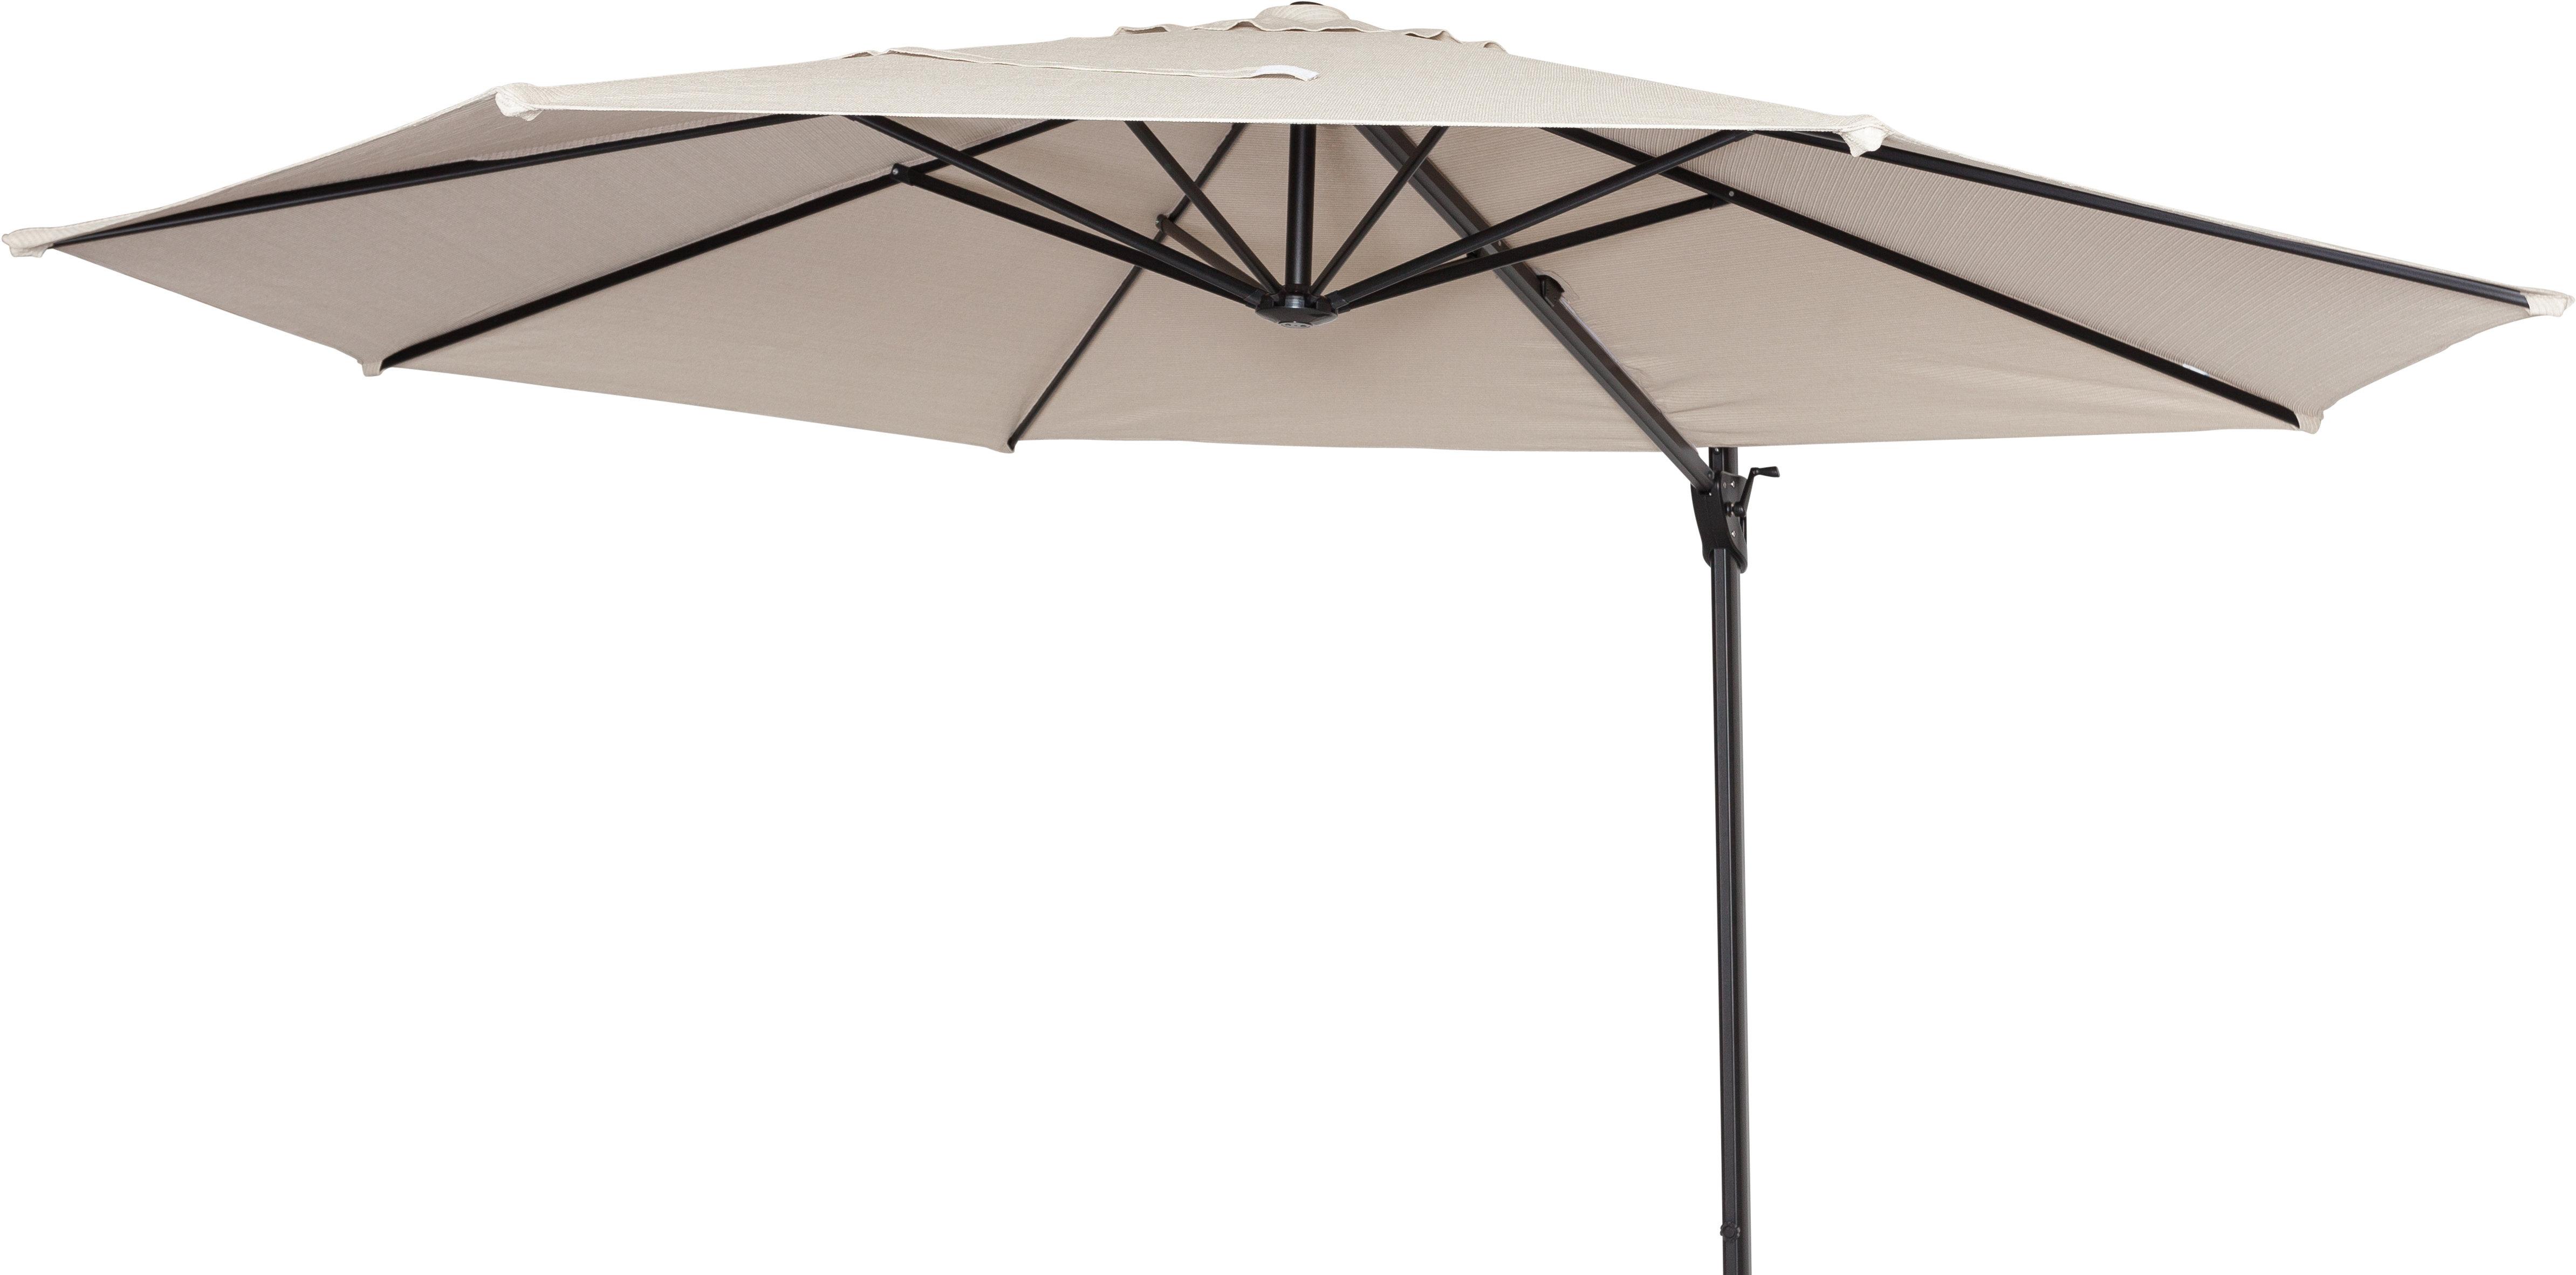 Fazeley  Rectangular Cantilever Umbrellas Inside Best And Newest 12' Cantilever Umbrella (View 9 of 20)